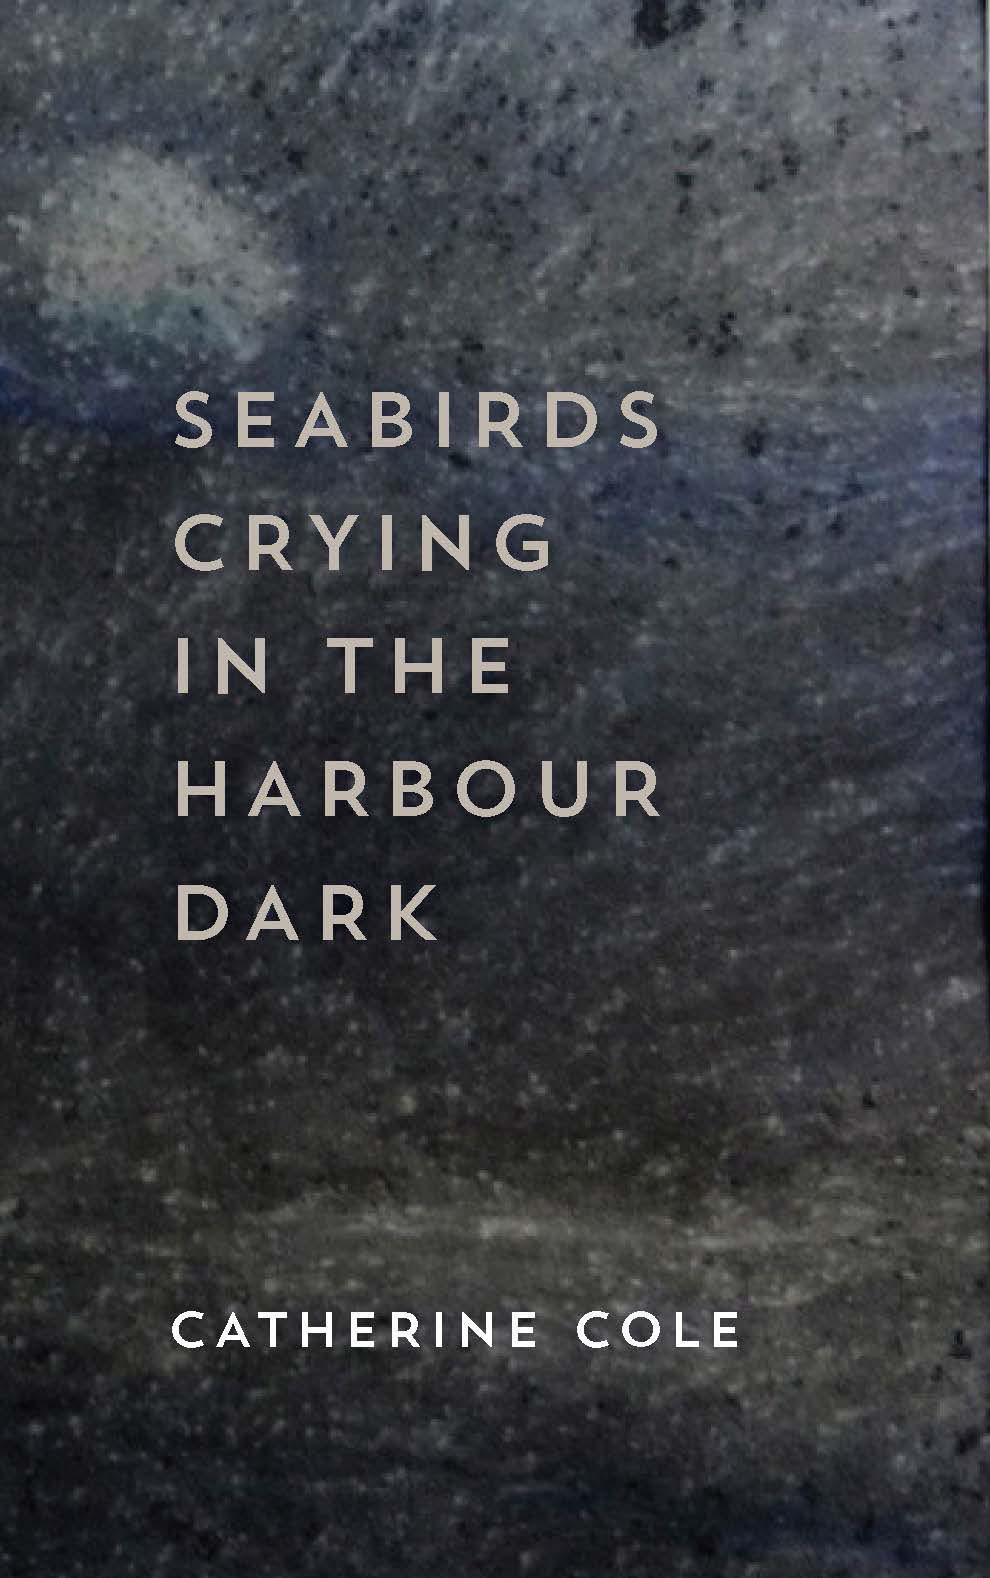 Seabirds Crying in theHarbourDark